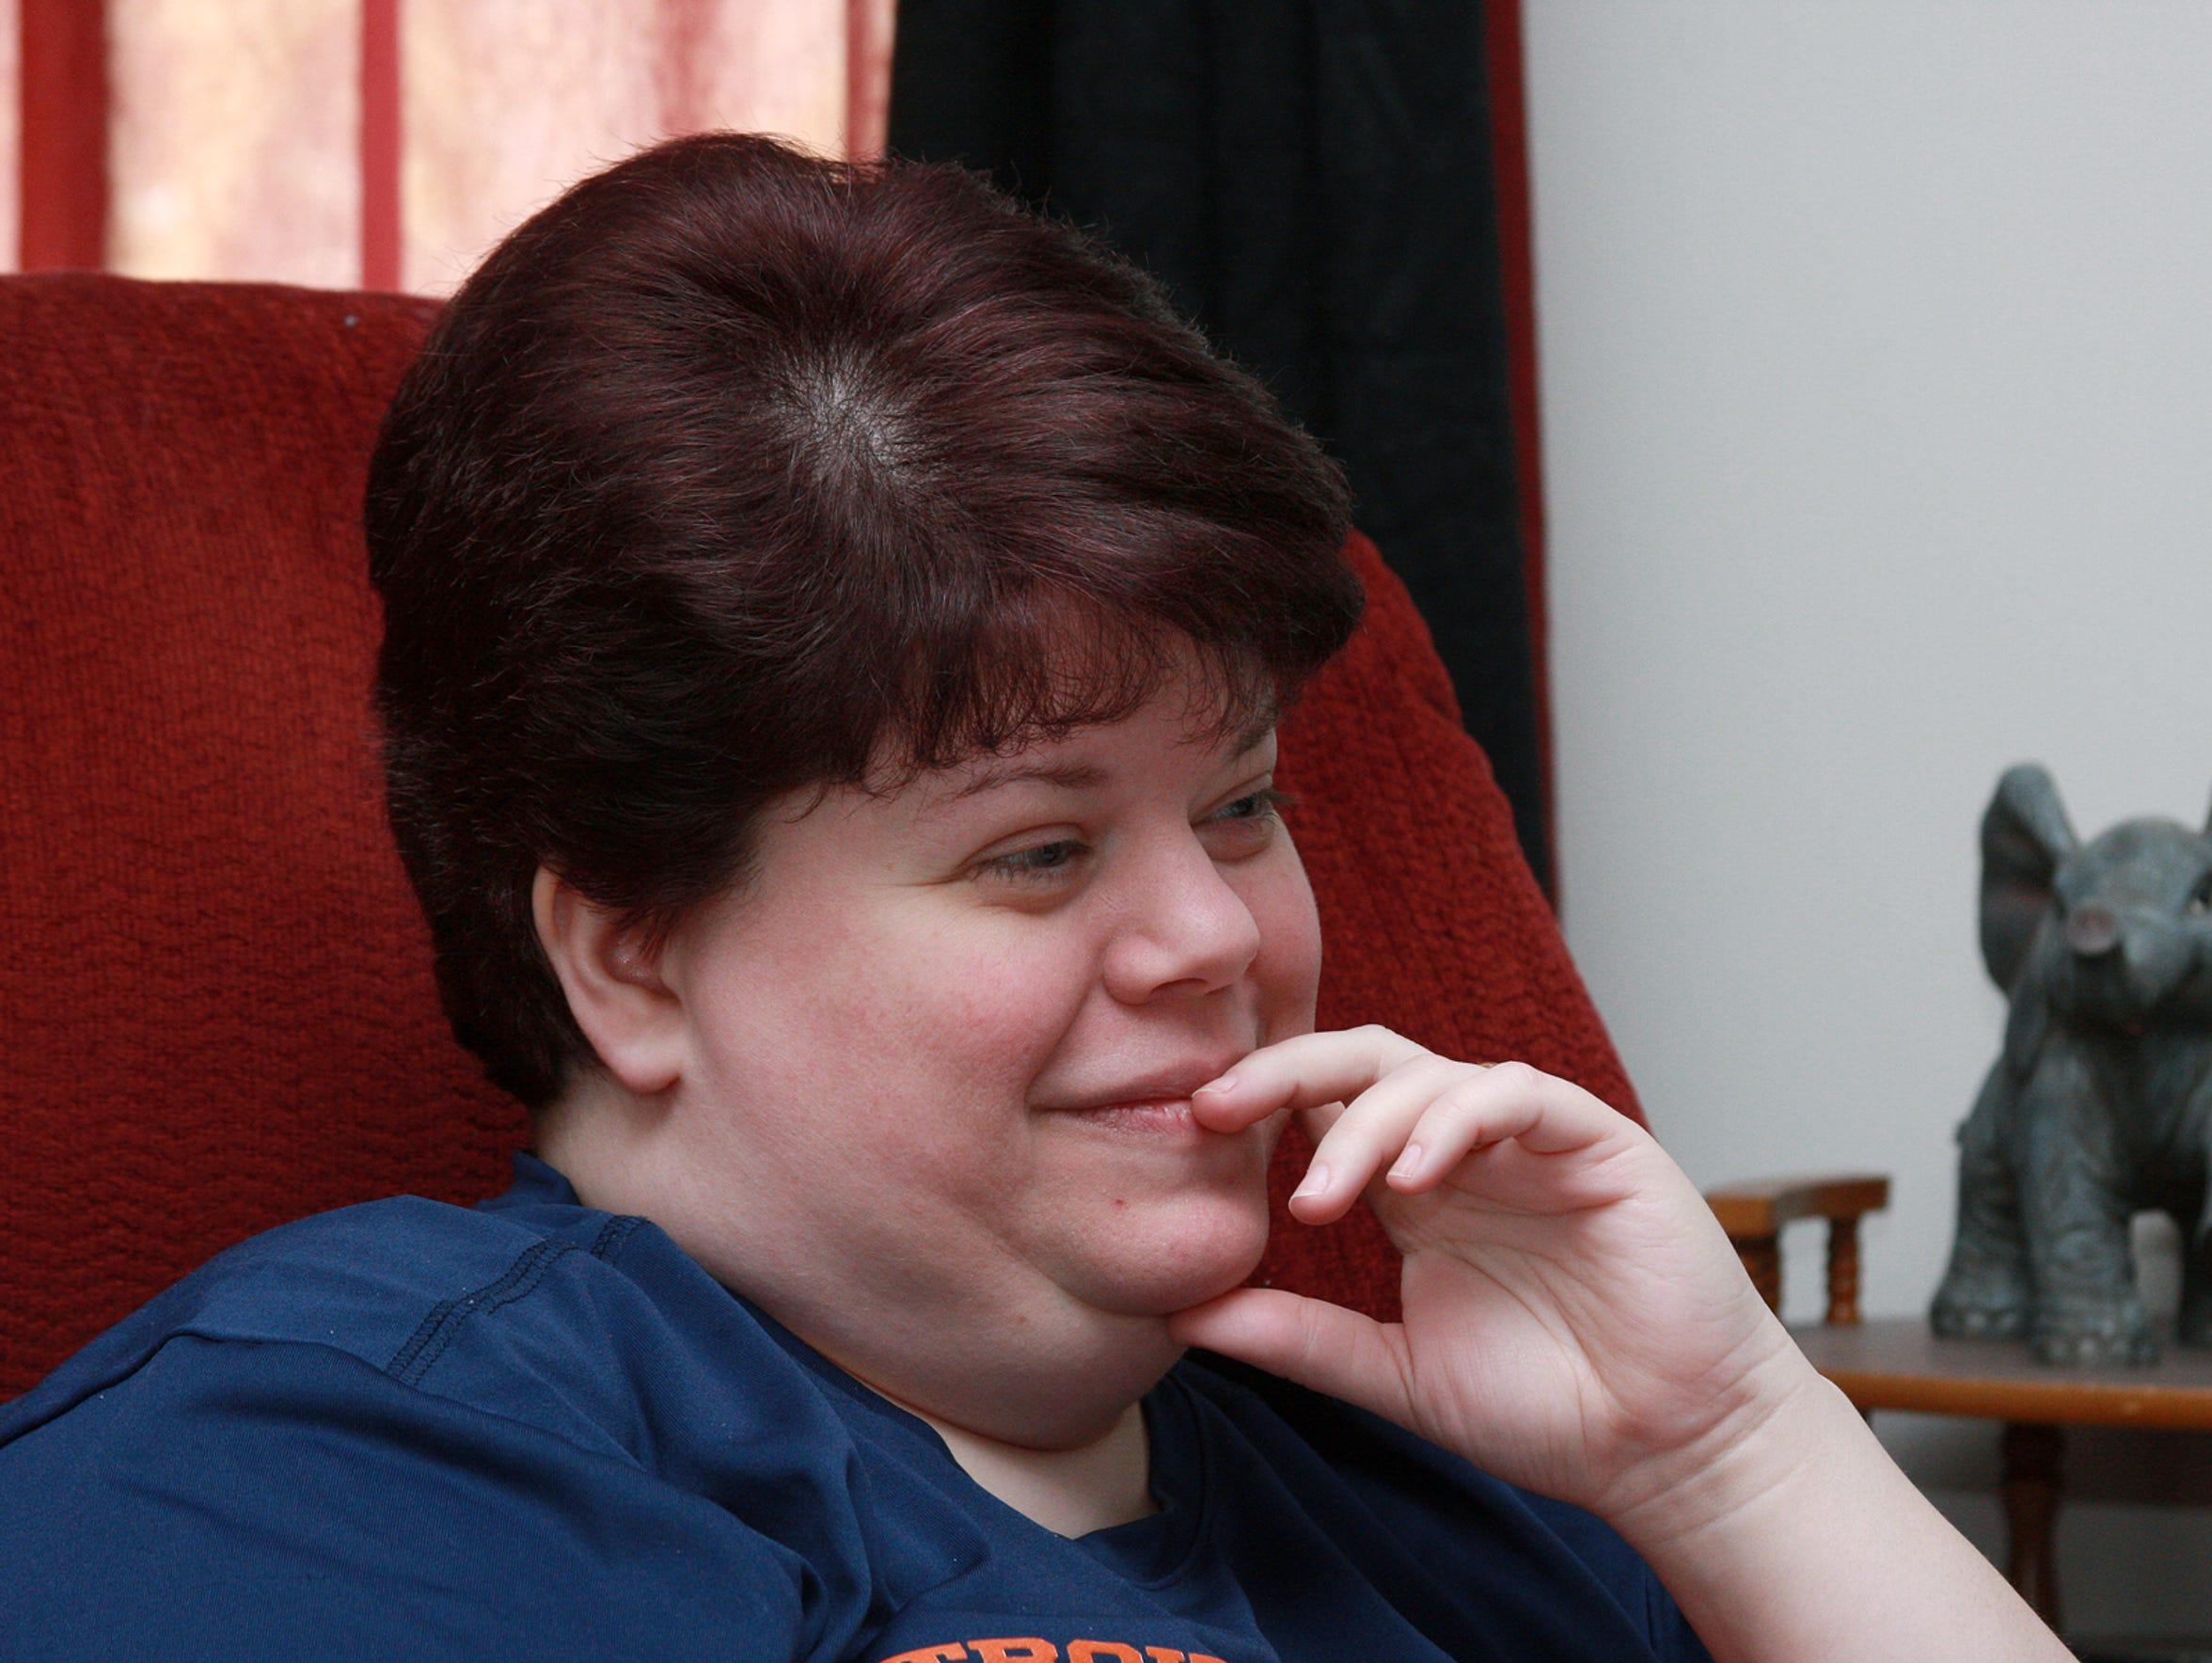 Vicki Kopf, mother of Abigail Kopf, the youngest survivor